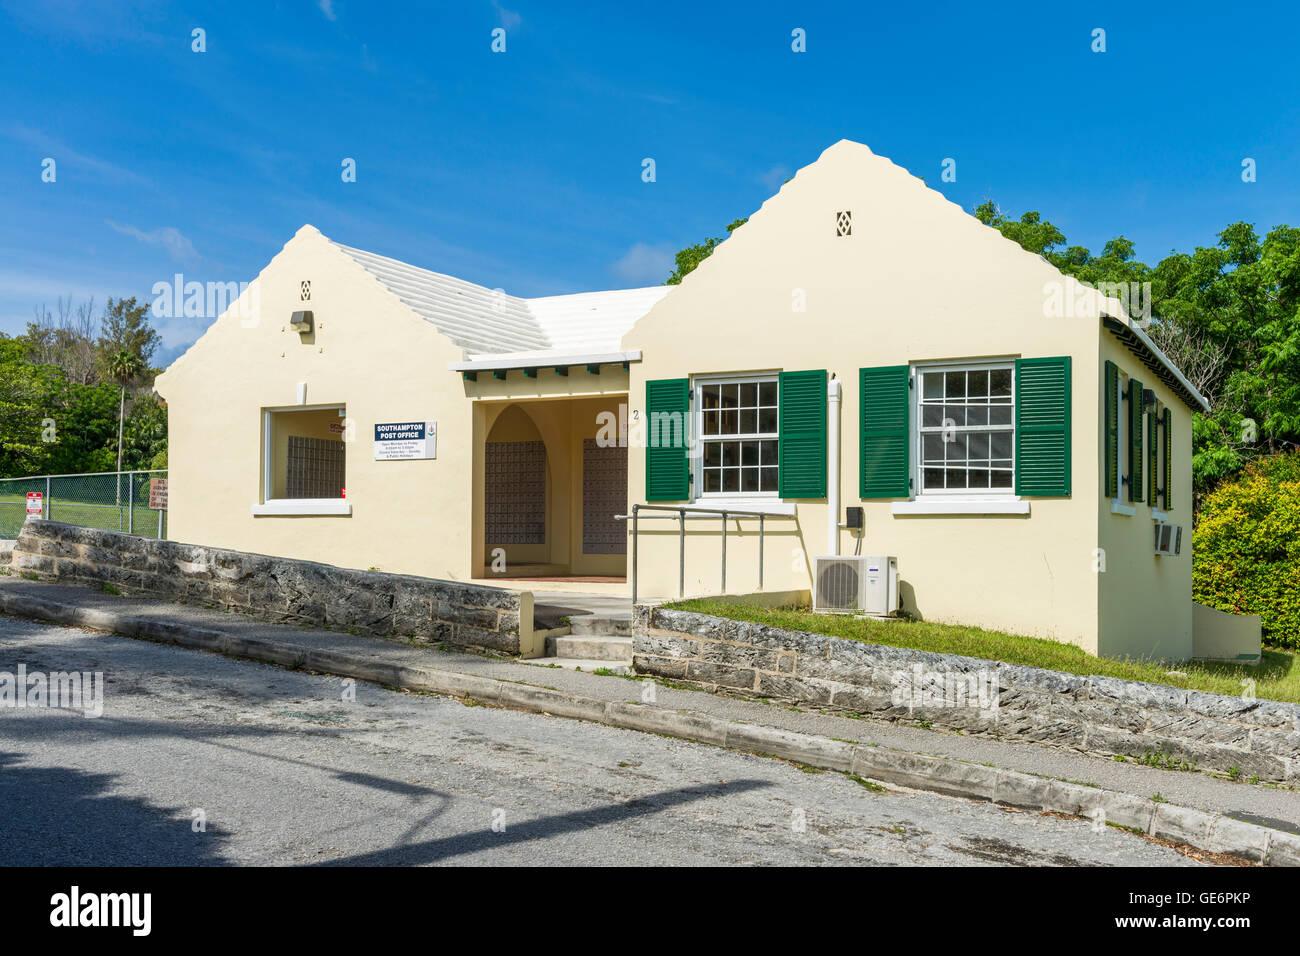 Green-shuttered Southampton Post Office, Southampton, Bermuda - Stock Image